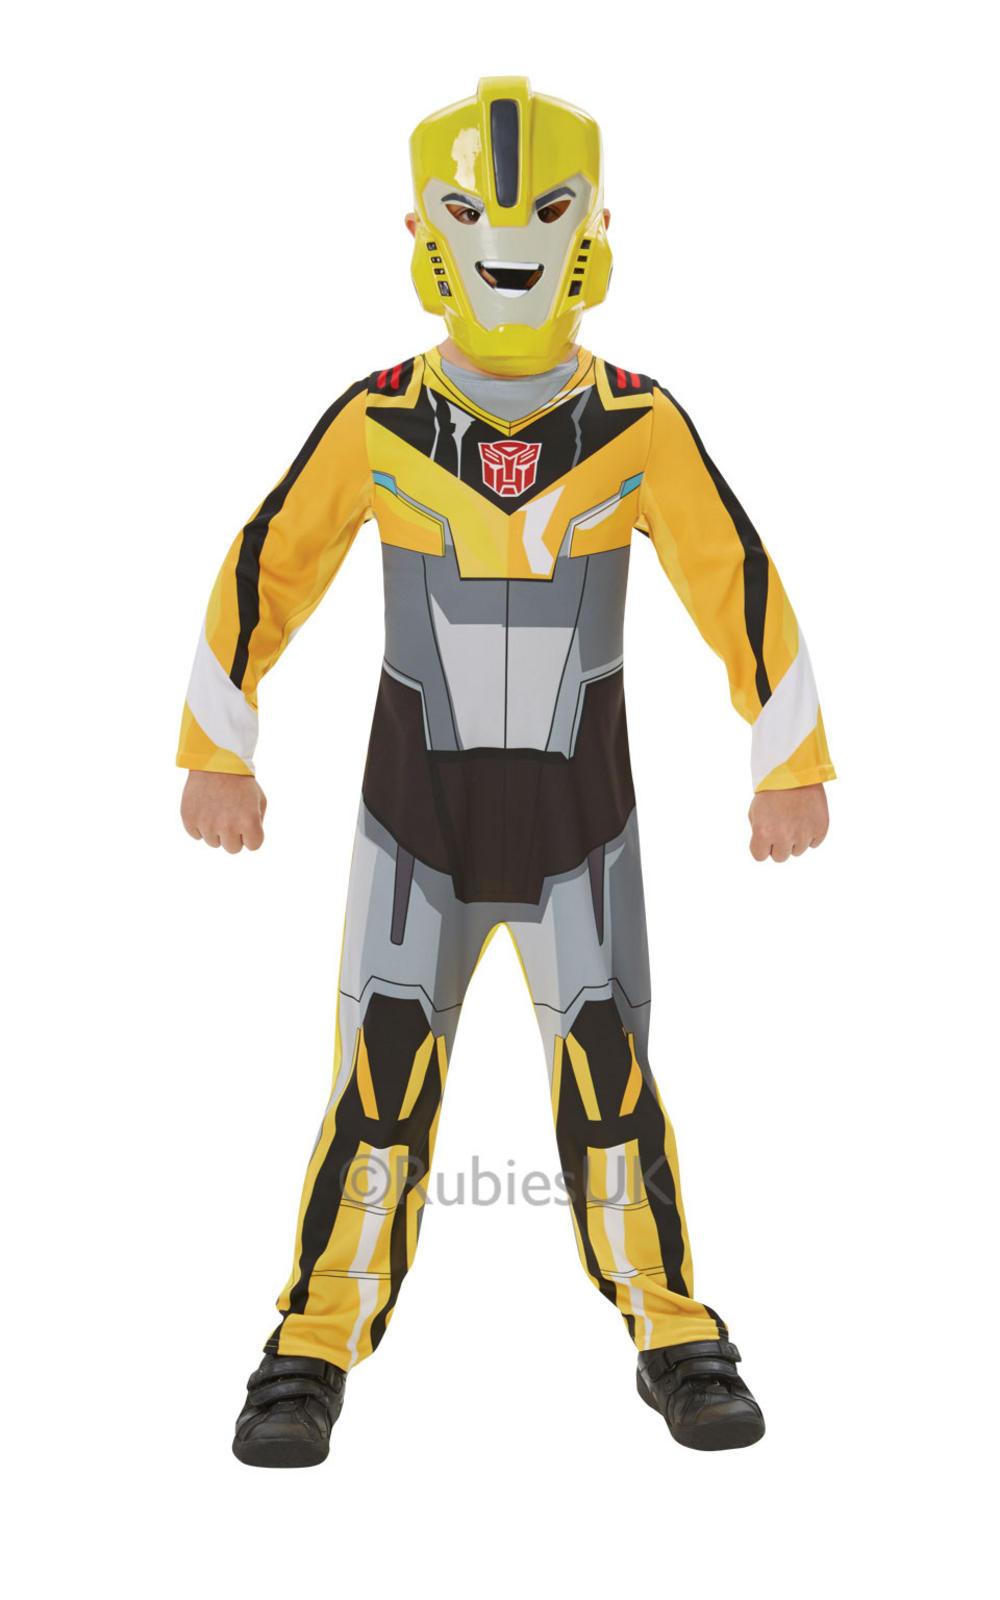 Bumble Bee Classic Costume Kids Halloween Costumes Mega Fancy Dress